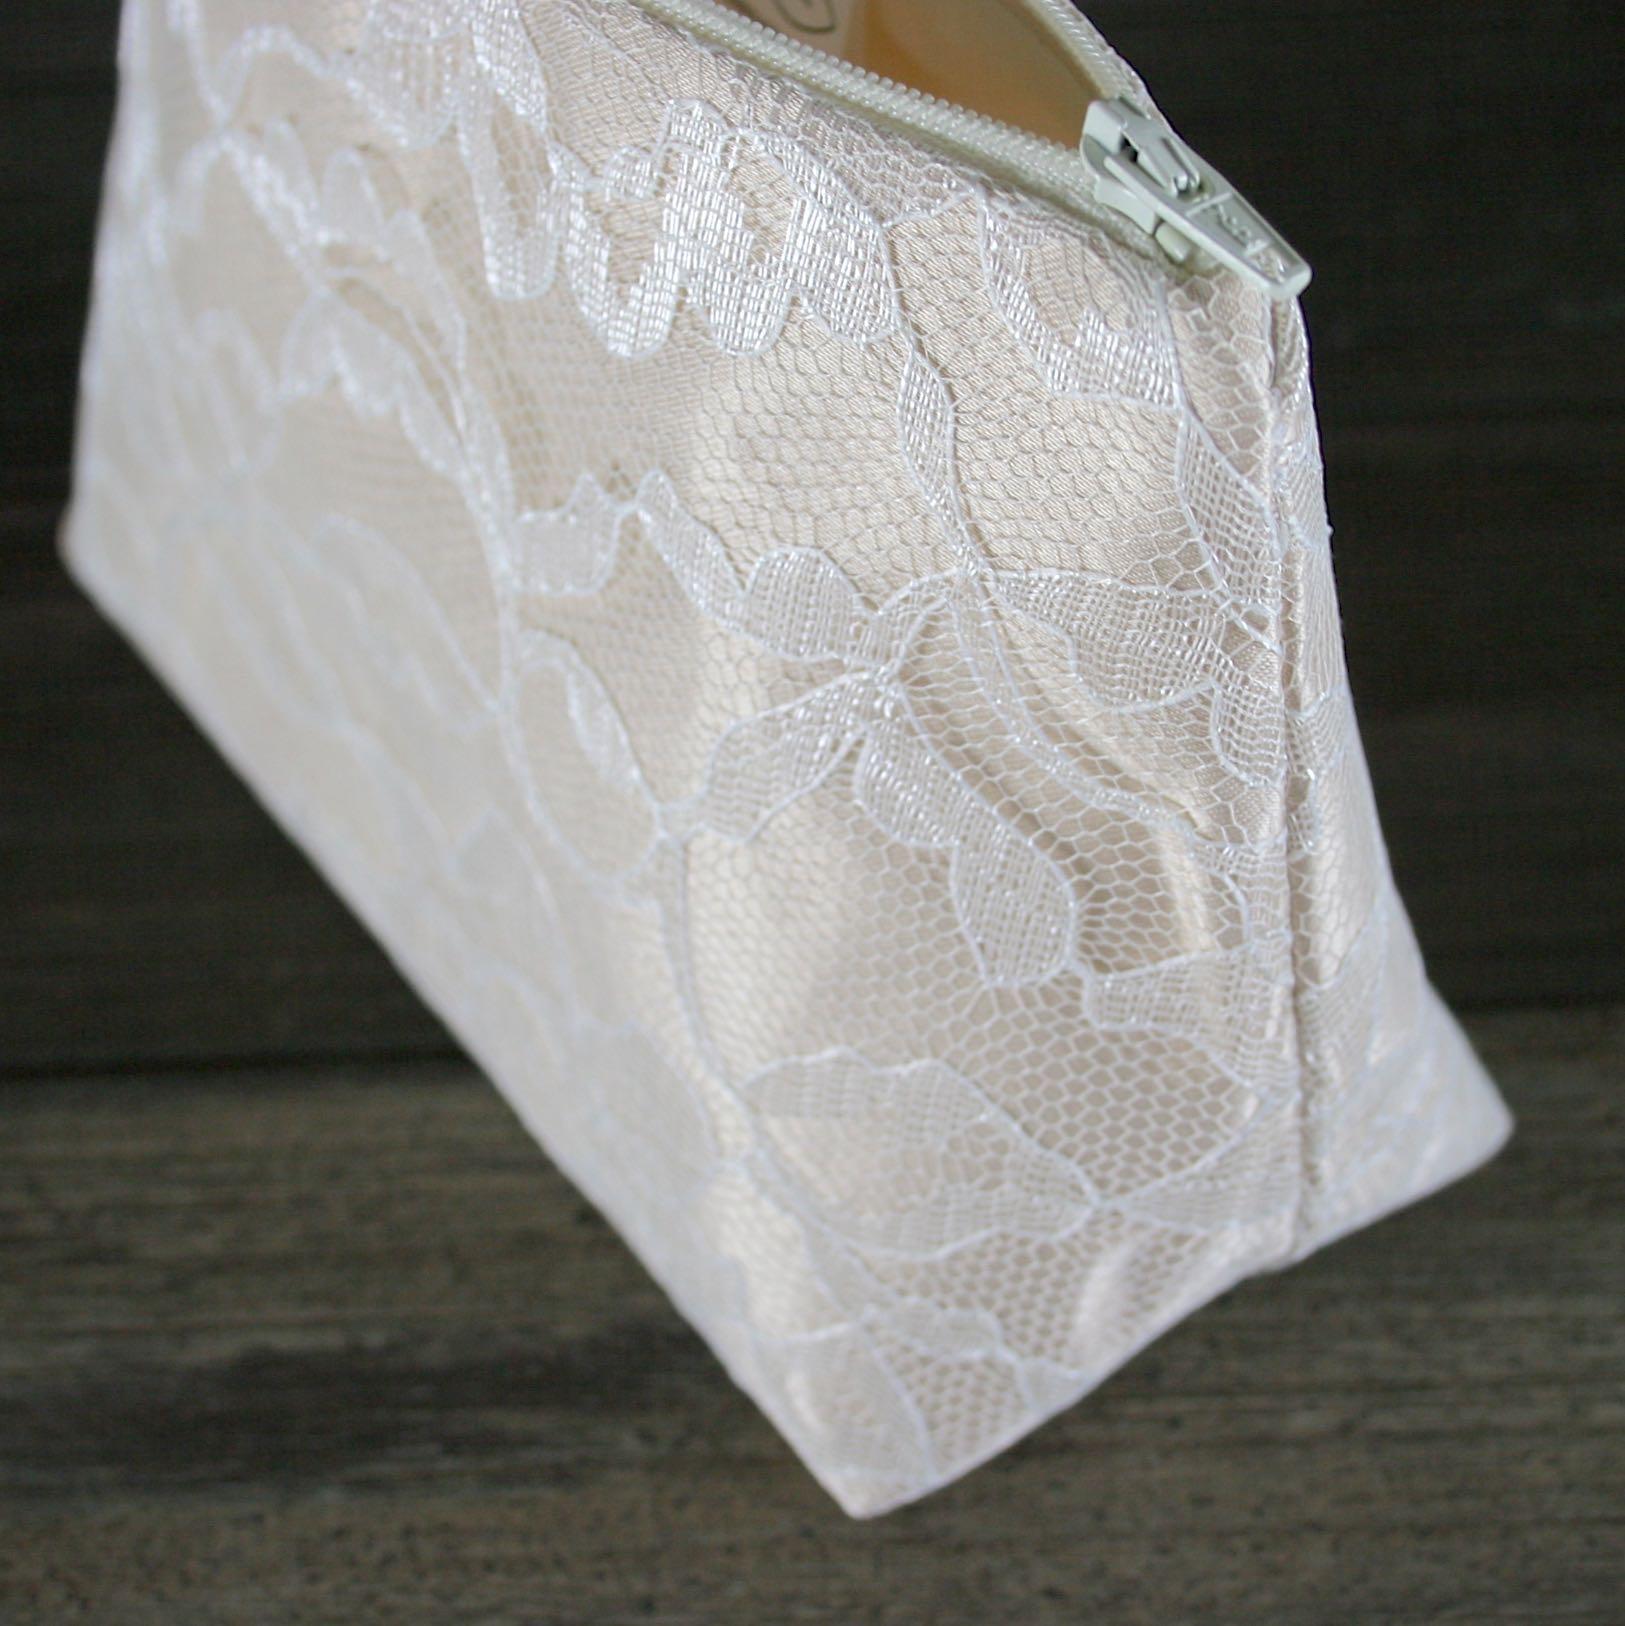 Champaign Satin & Ivory Lace Bridesmaid Gift - Le Pique Nique by Jordani Sarreal 03.jpg